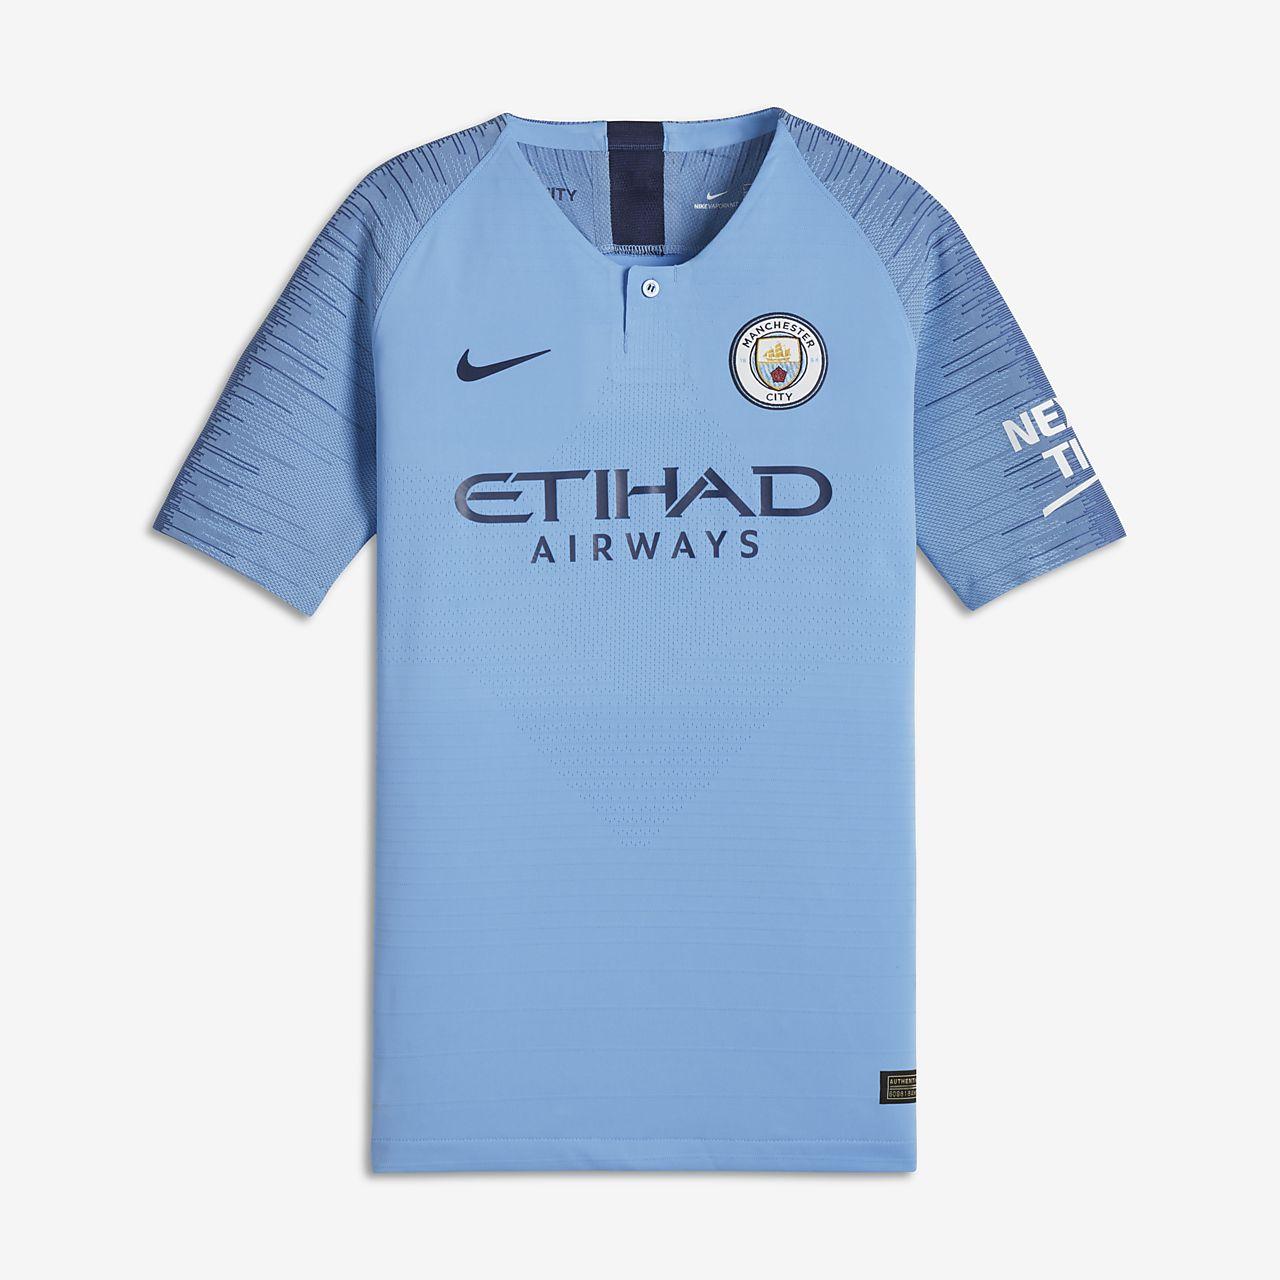 2018/19 Manchester City FC Vapor Match Home Fußballtrikot für ältere Kinder